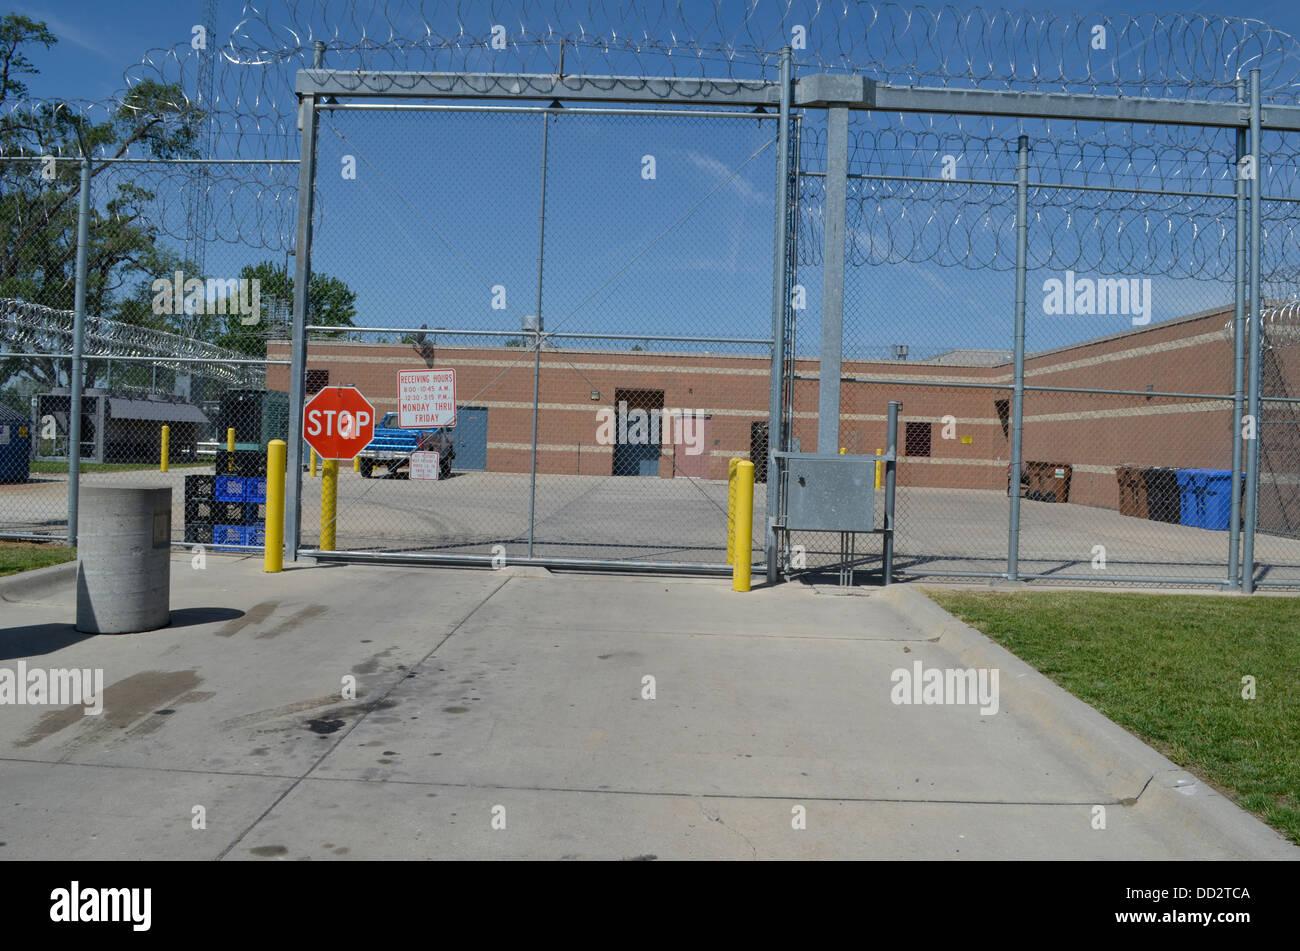 Perimeter fence at maximum security prison for juveniles in Omaha Nebraska. - Stock Image